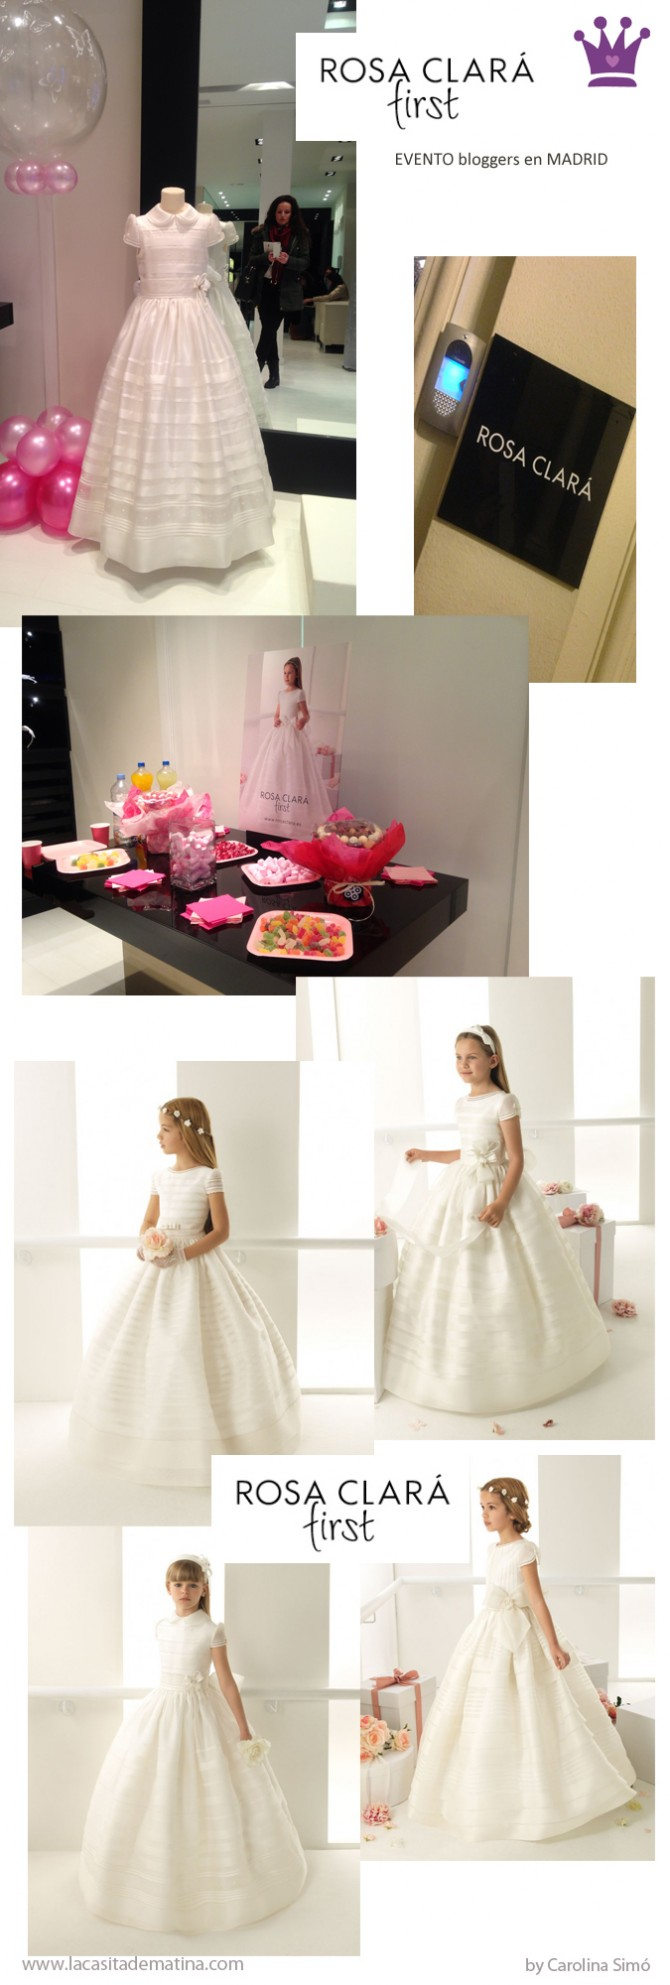 Vestidos de Comunión, Rosa Clará, La casita de Martina, Blog de Moda Infantil, Carolina Simó